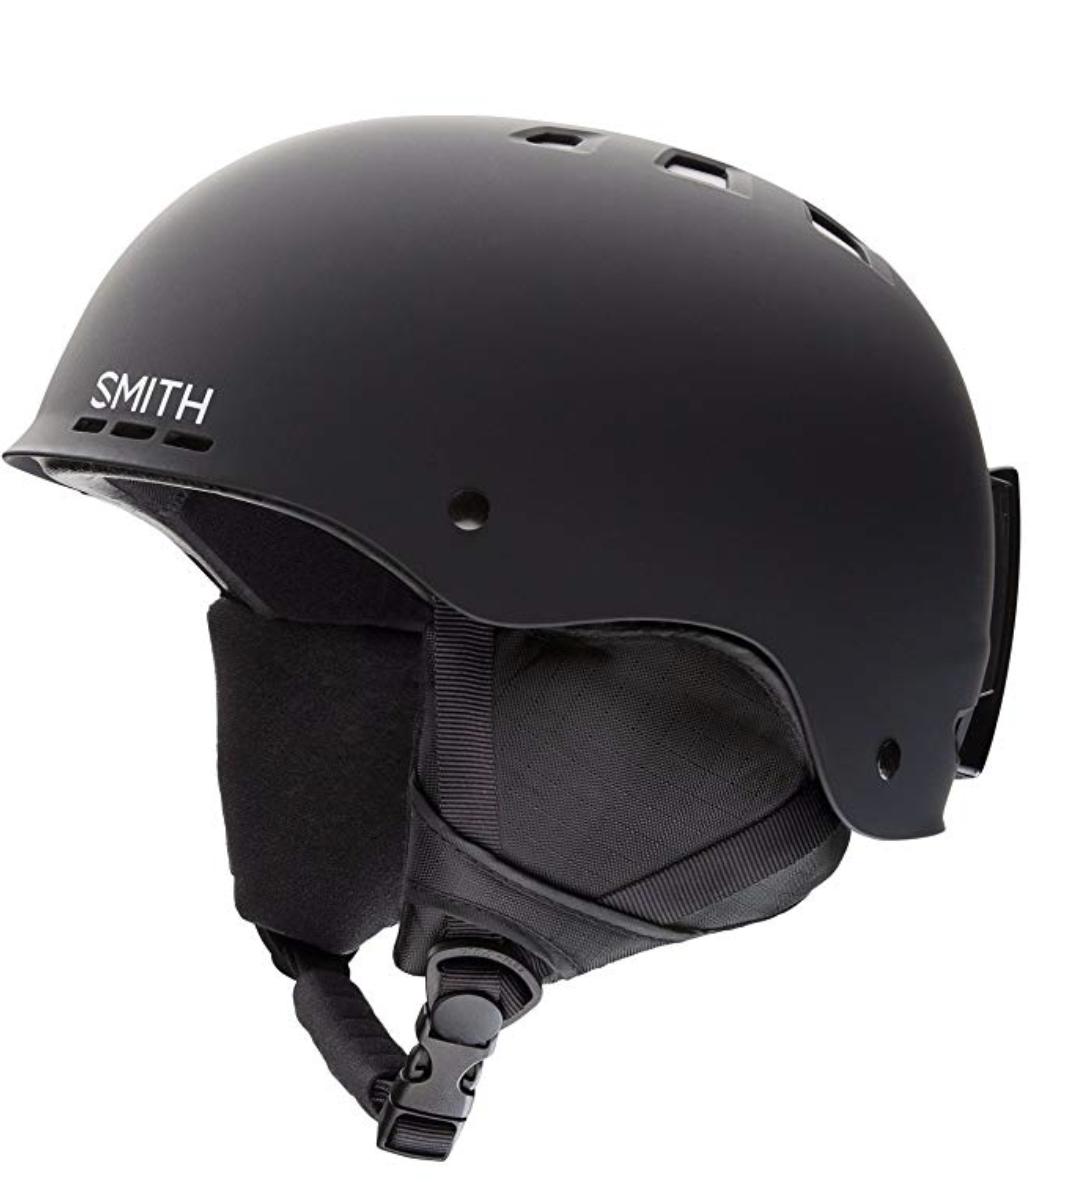 Smith Optics Best Cheap Men's Snowboard Helmets